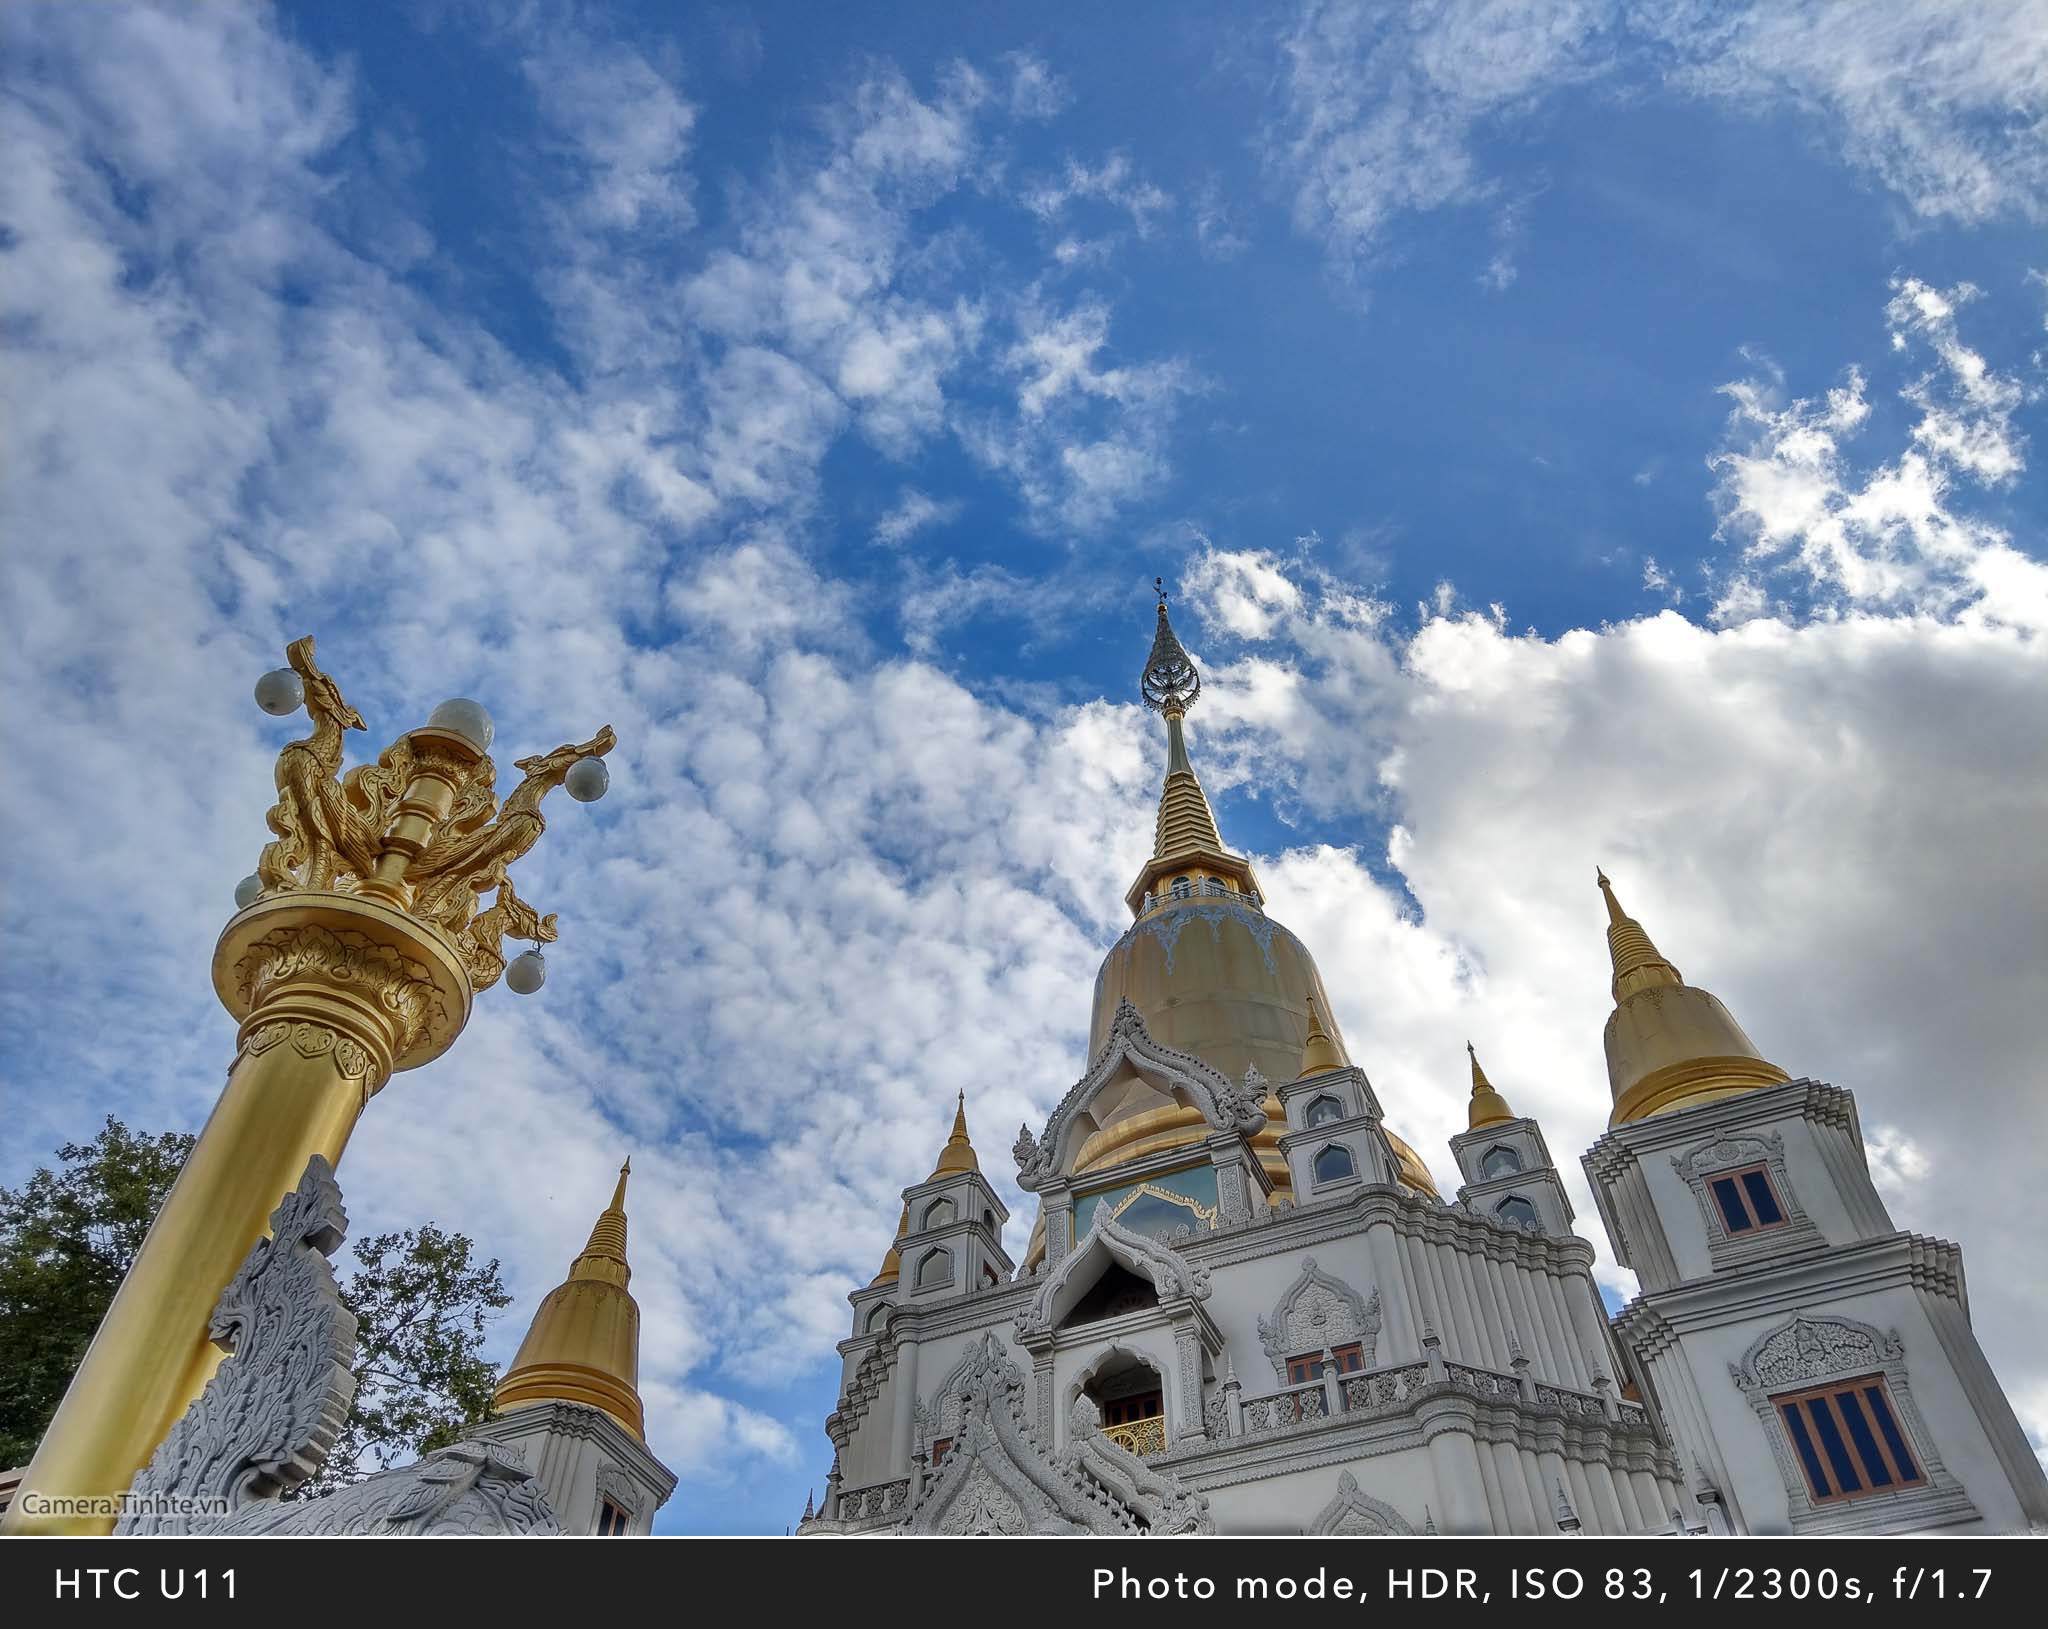 Camera.Tinhte_HTC U11_HDR_IMAG0322.jpg